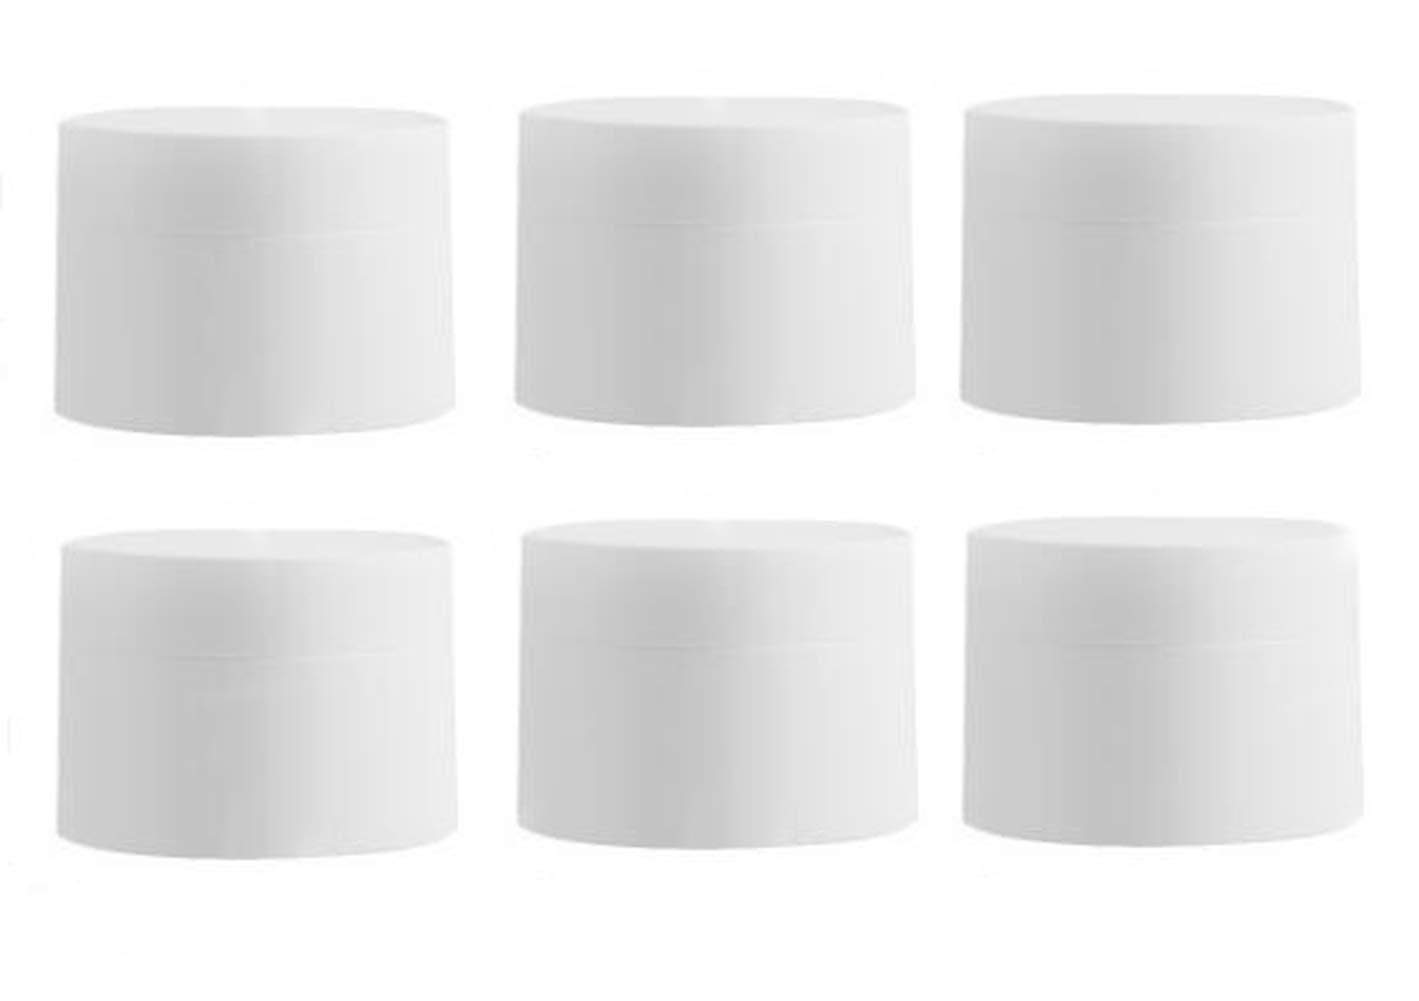 6PCS 80g 2.7oz Empty Refill Nippon Tucson Mall regular agency Scrub Cosmetic Sample Plastic White